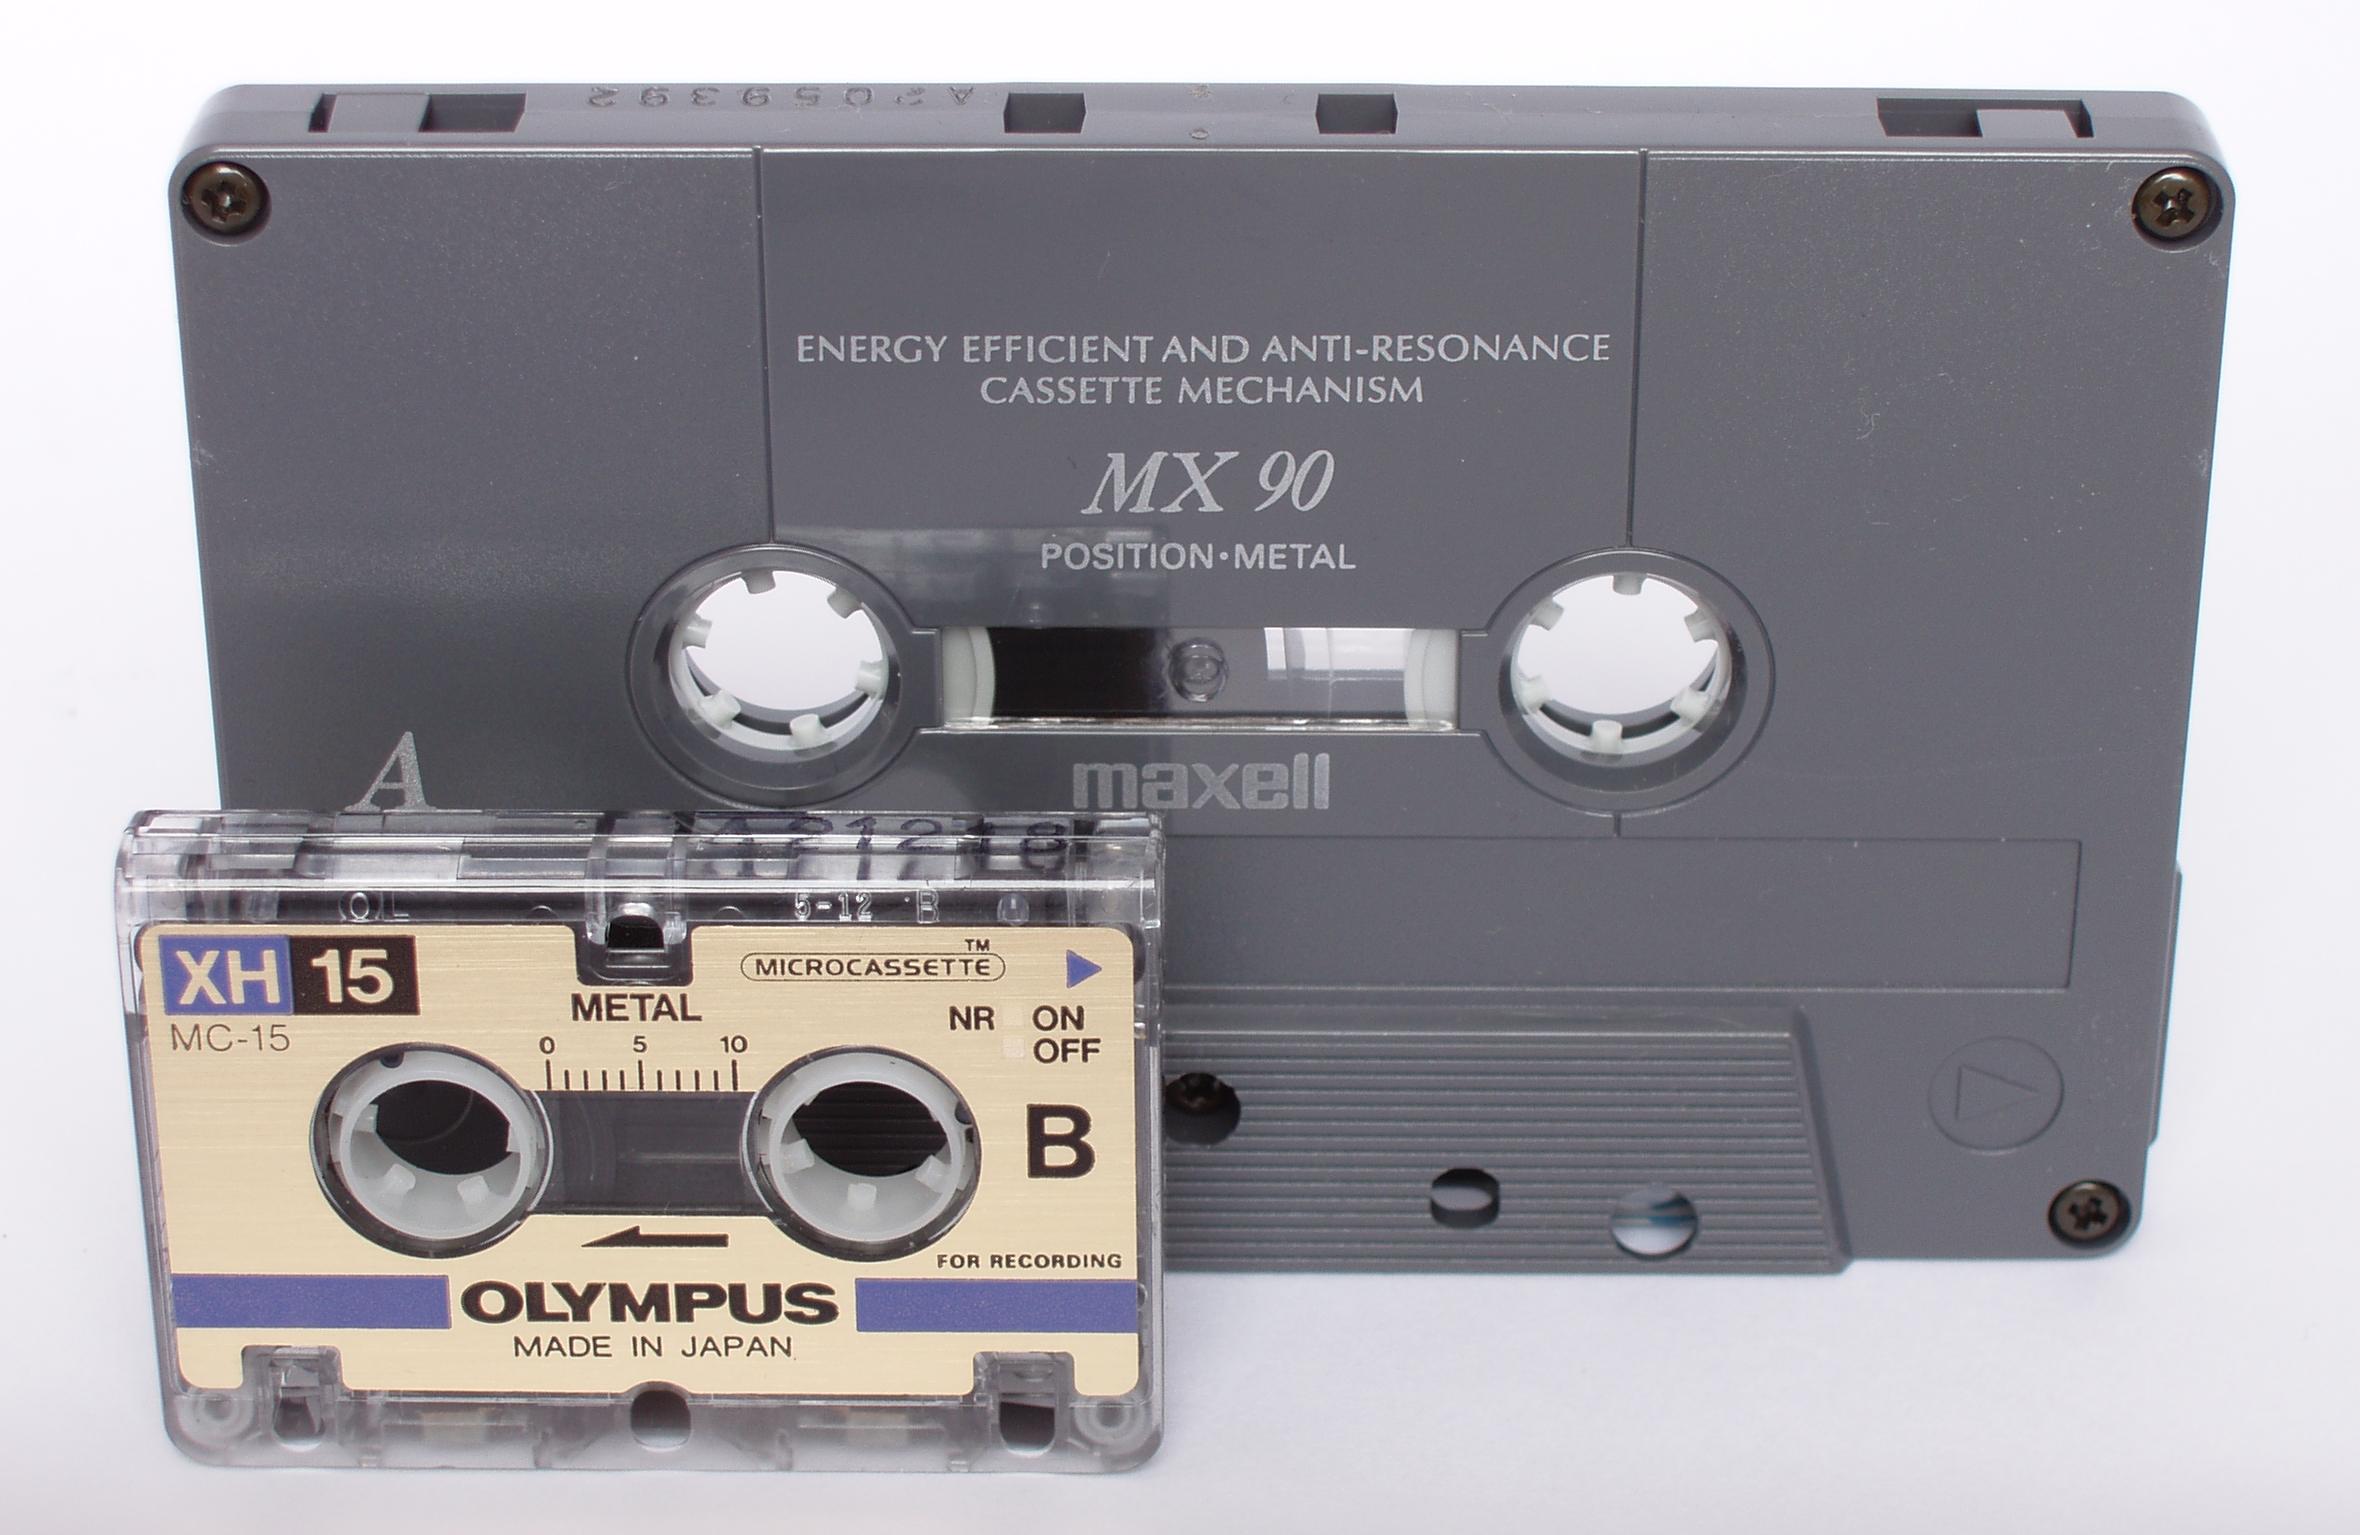 CassetteAndMicrocassette.jpg